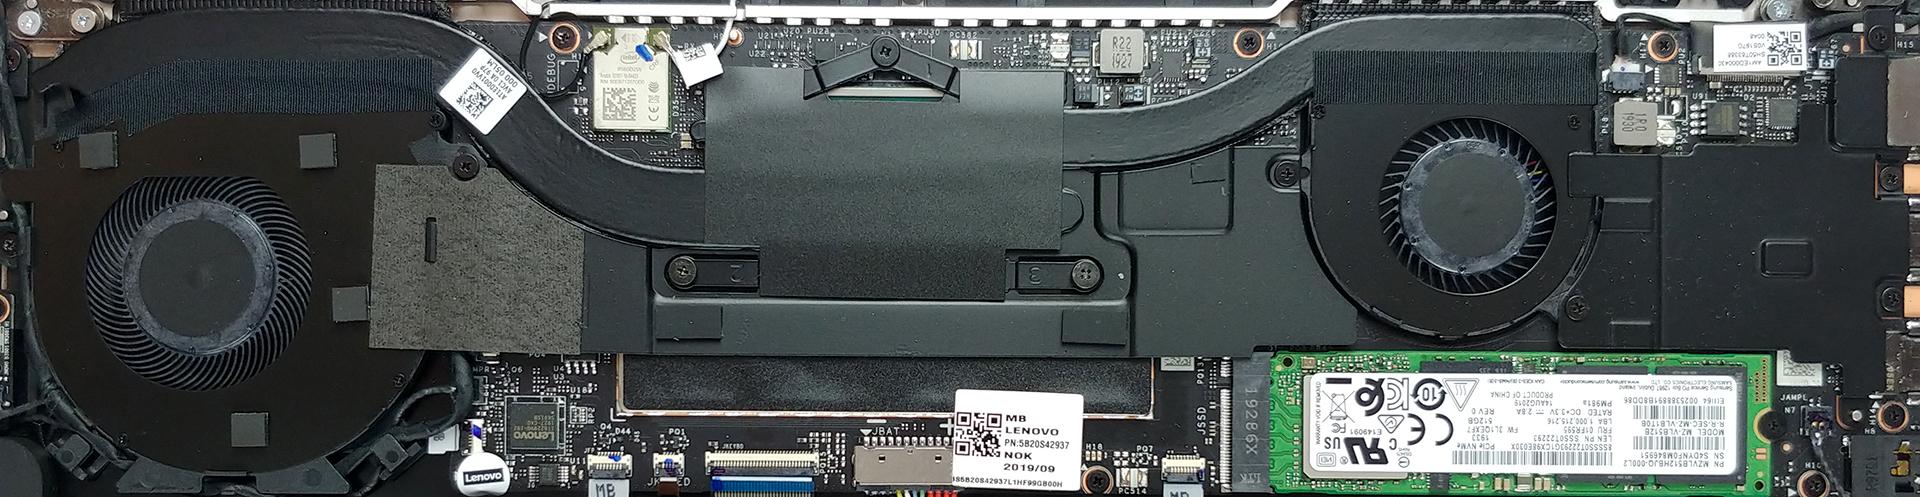 Lenovo Yoga C940 (14) review – a premium 2-in-1 rocking